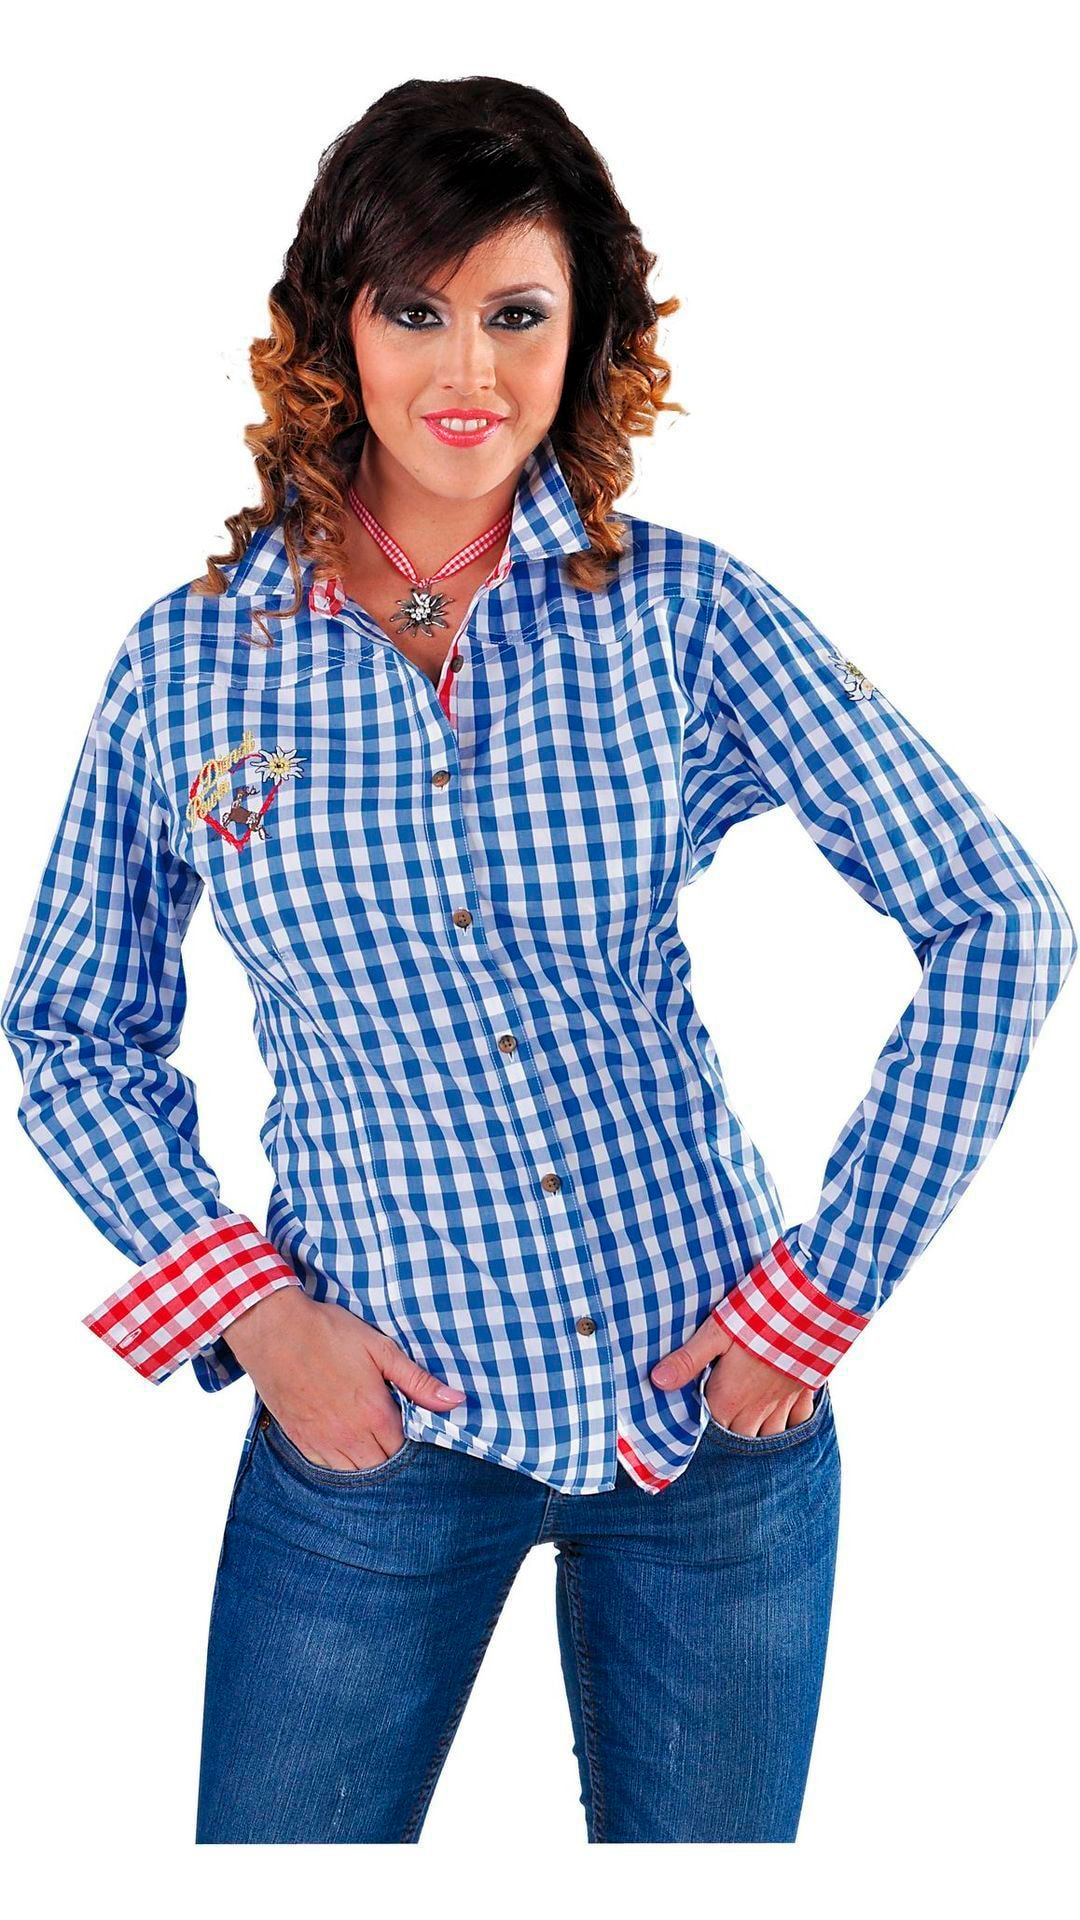 Blauwe tiroler blouse vrouw